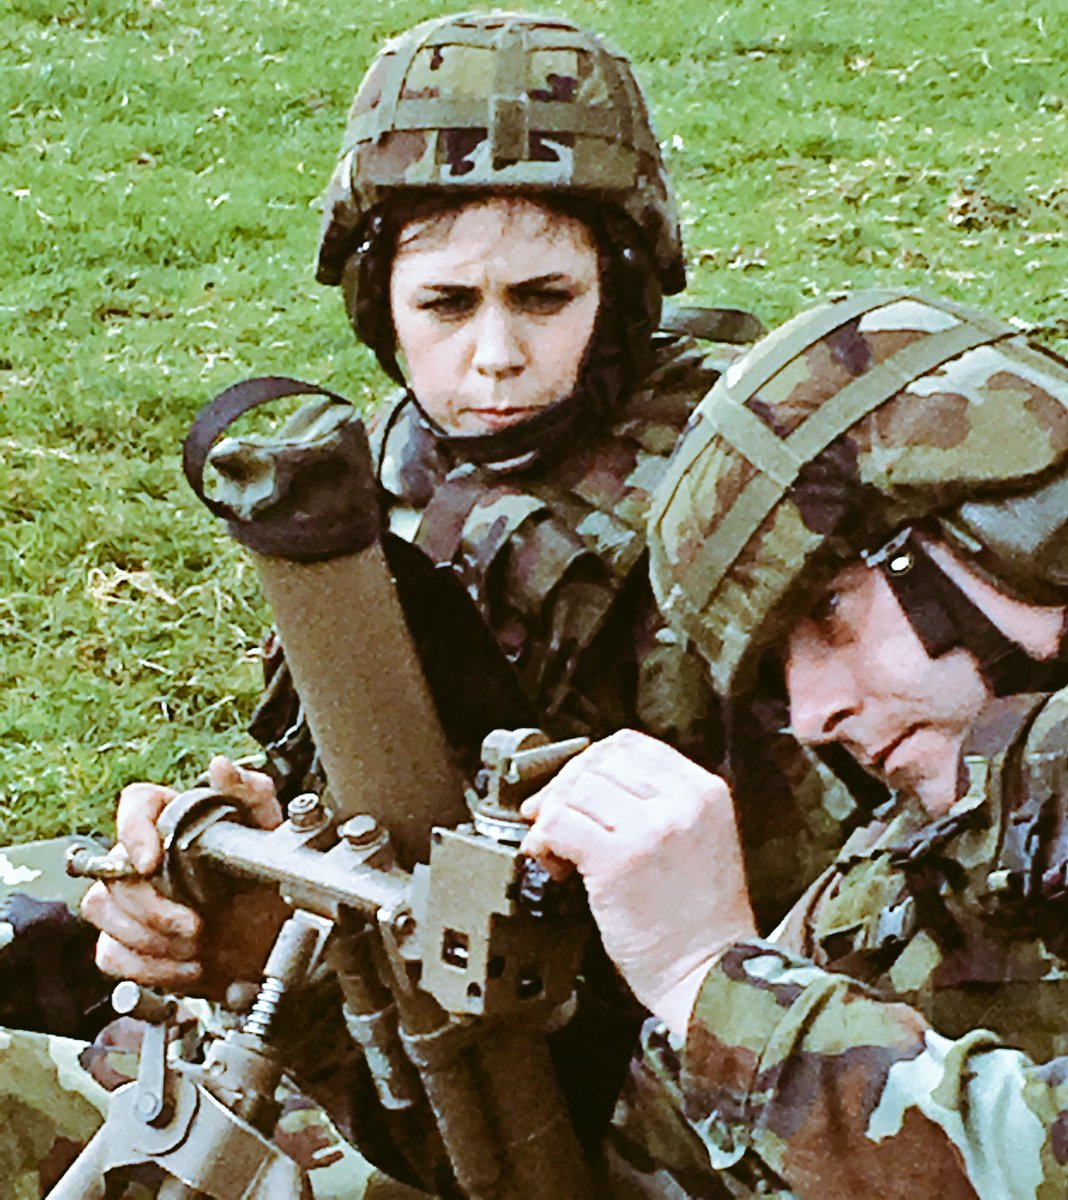 6 Inf Bn firing the 60mm mortar in Glen of Imaal #joinourteam #RDF<br>http://pic.twitter.com/m8828PVMJR